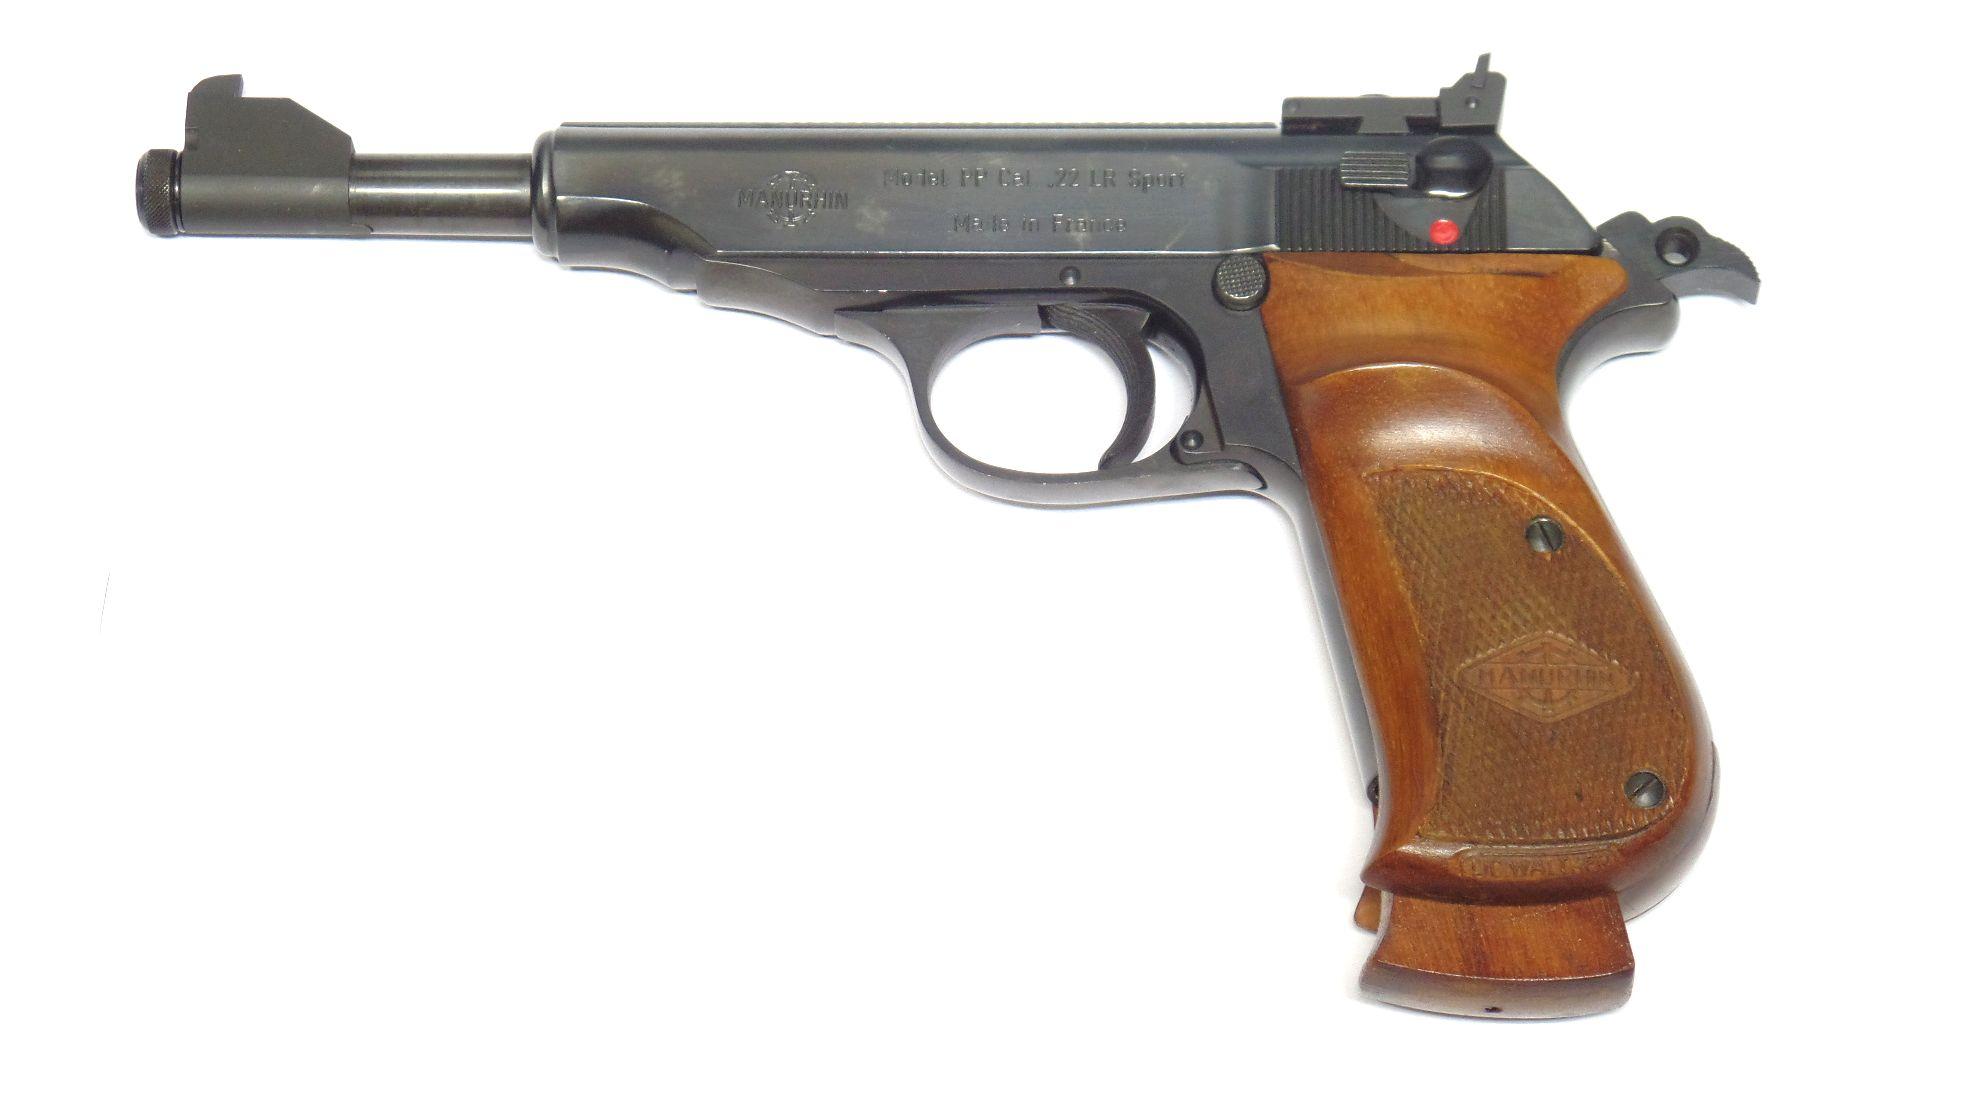 WALTHER MANURHIN PP SPORT calibre 22LR